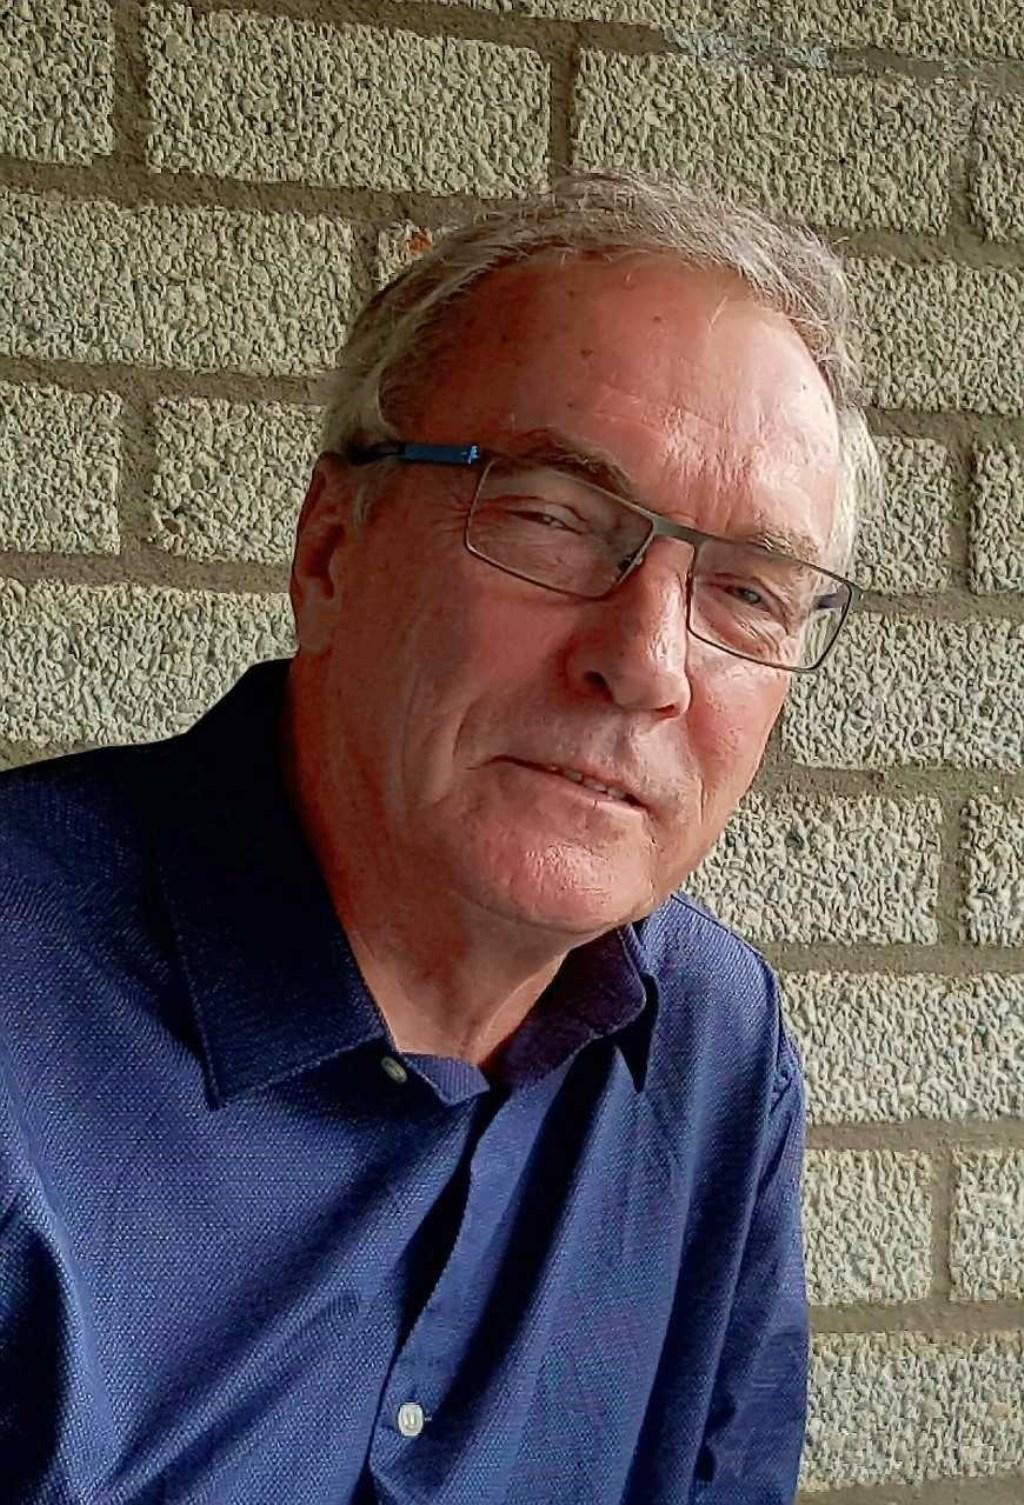 André Numan Foto: Aangeleverd © Uitkijkpost Media B.v.